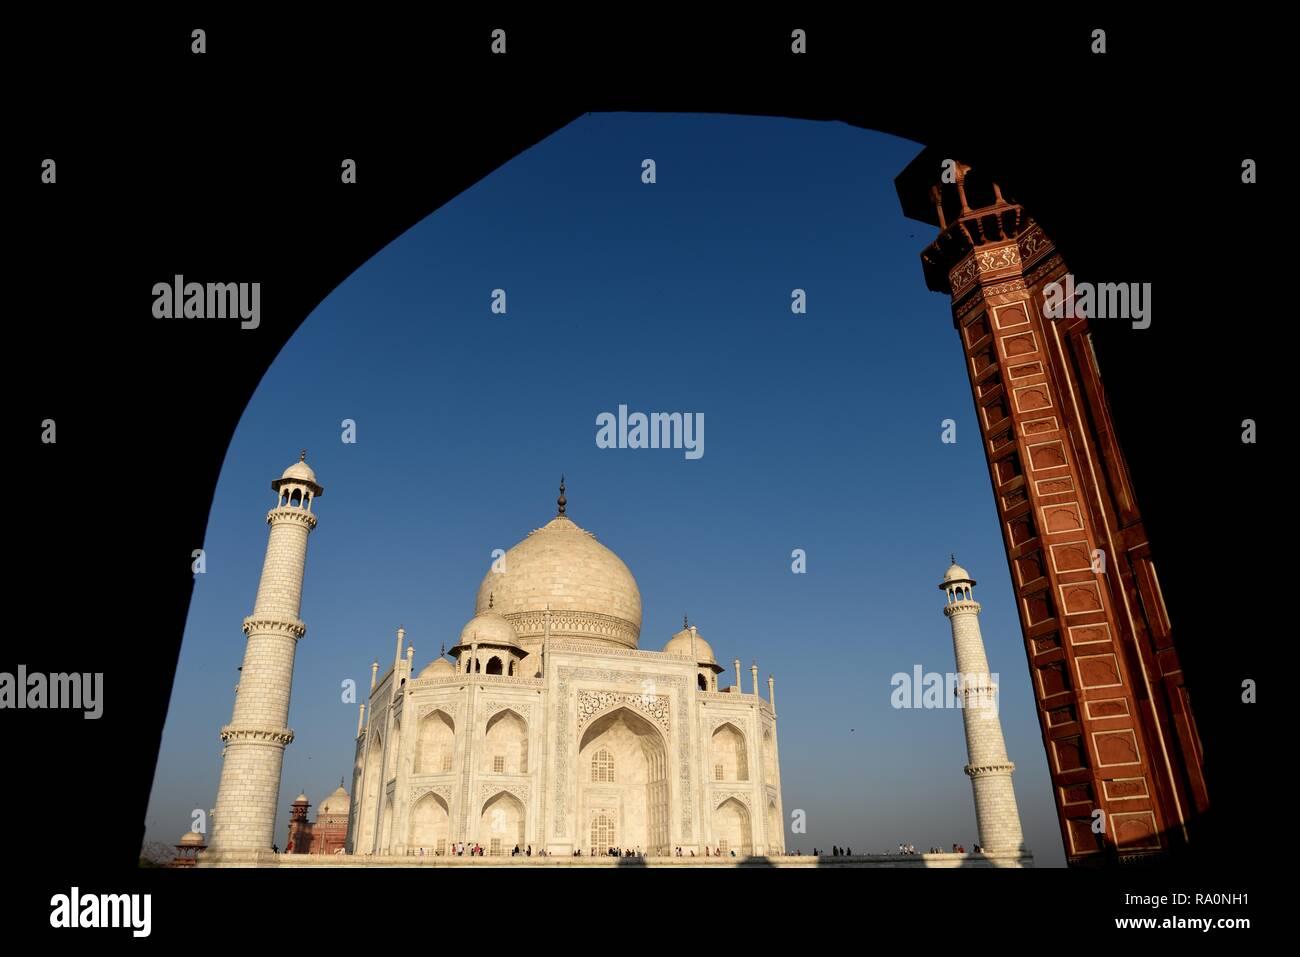 Framed angled view of the Taj Mahal at daybreak in Agra, India. - Stock Image